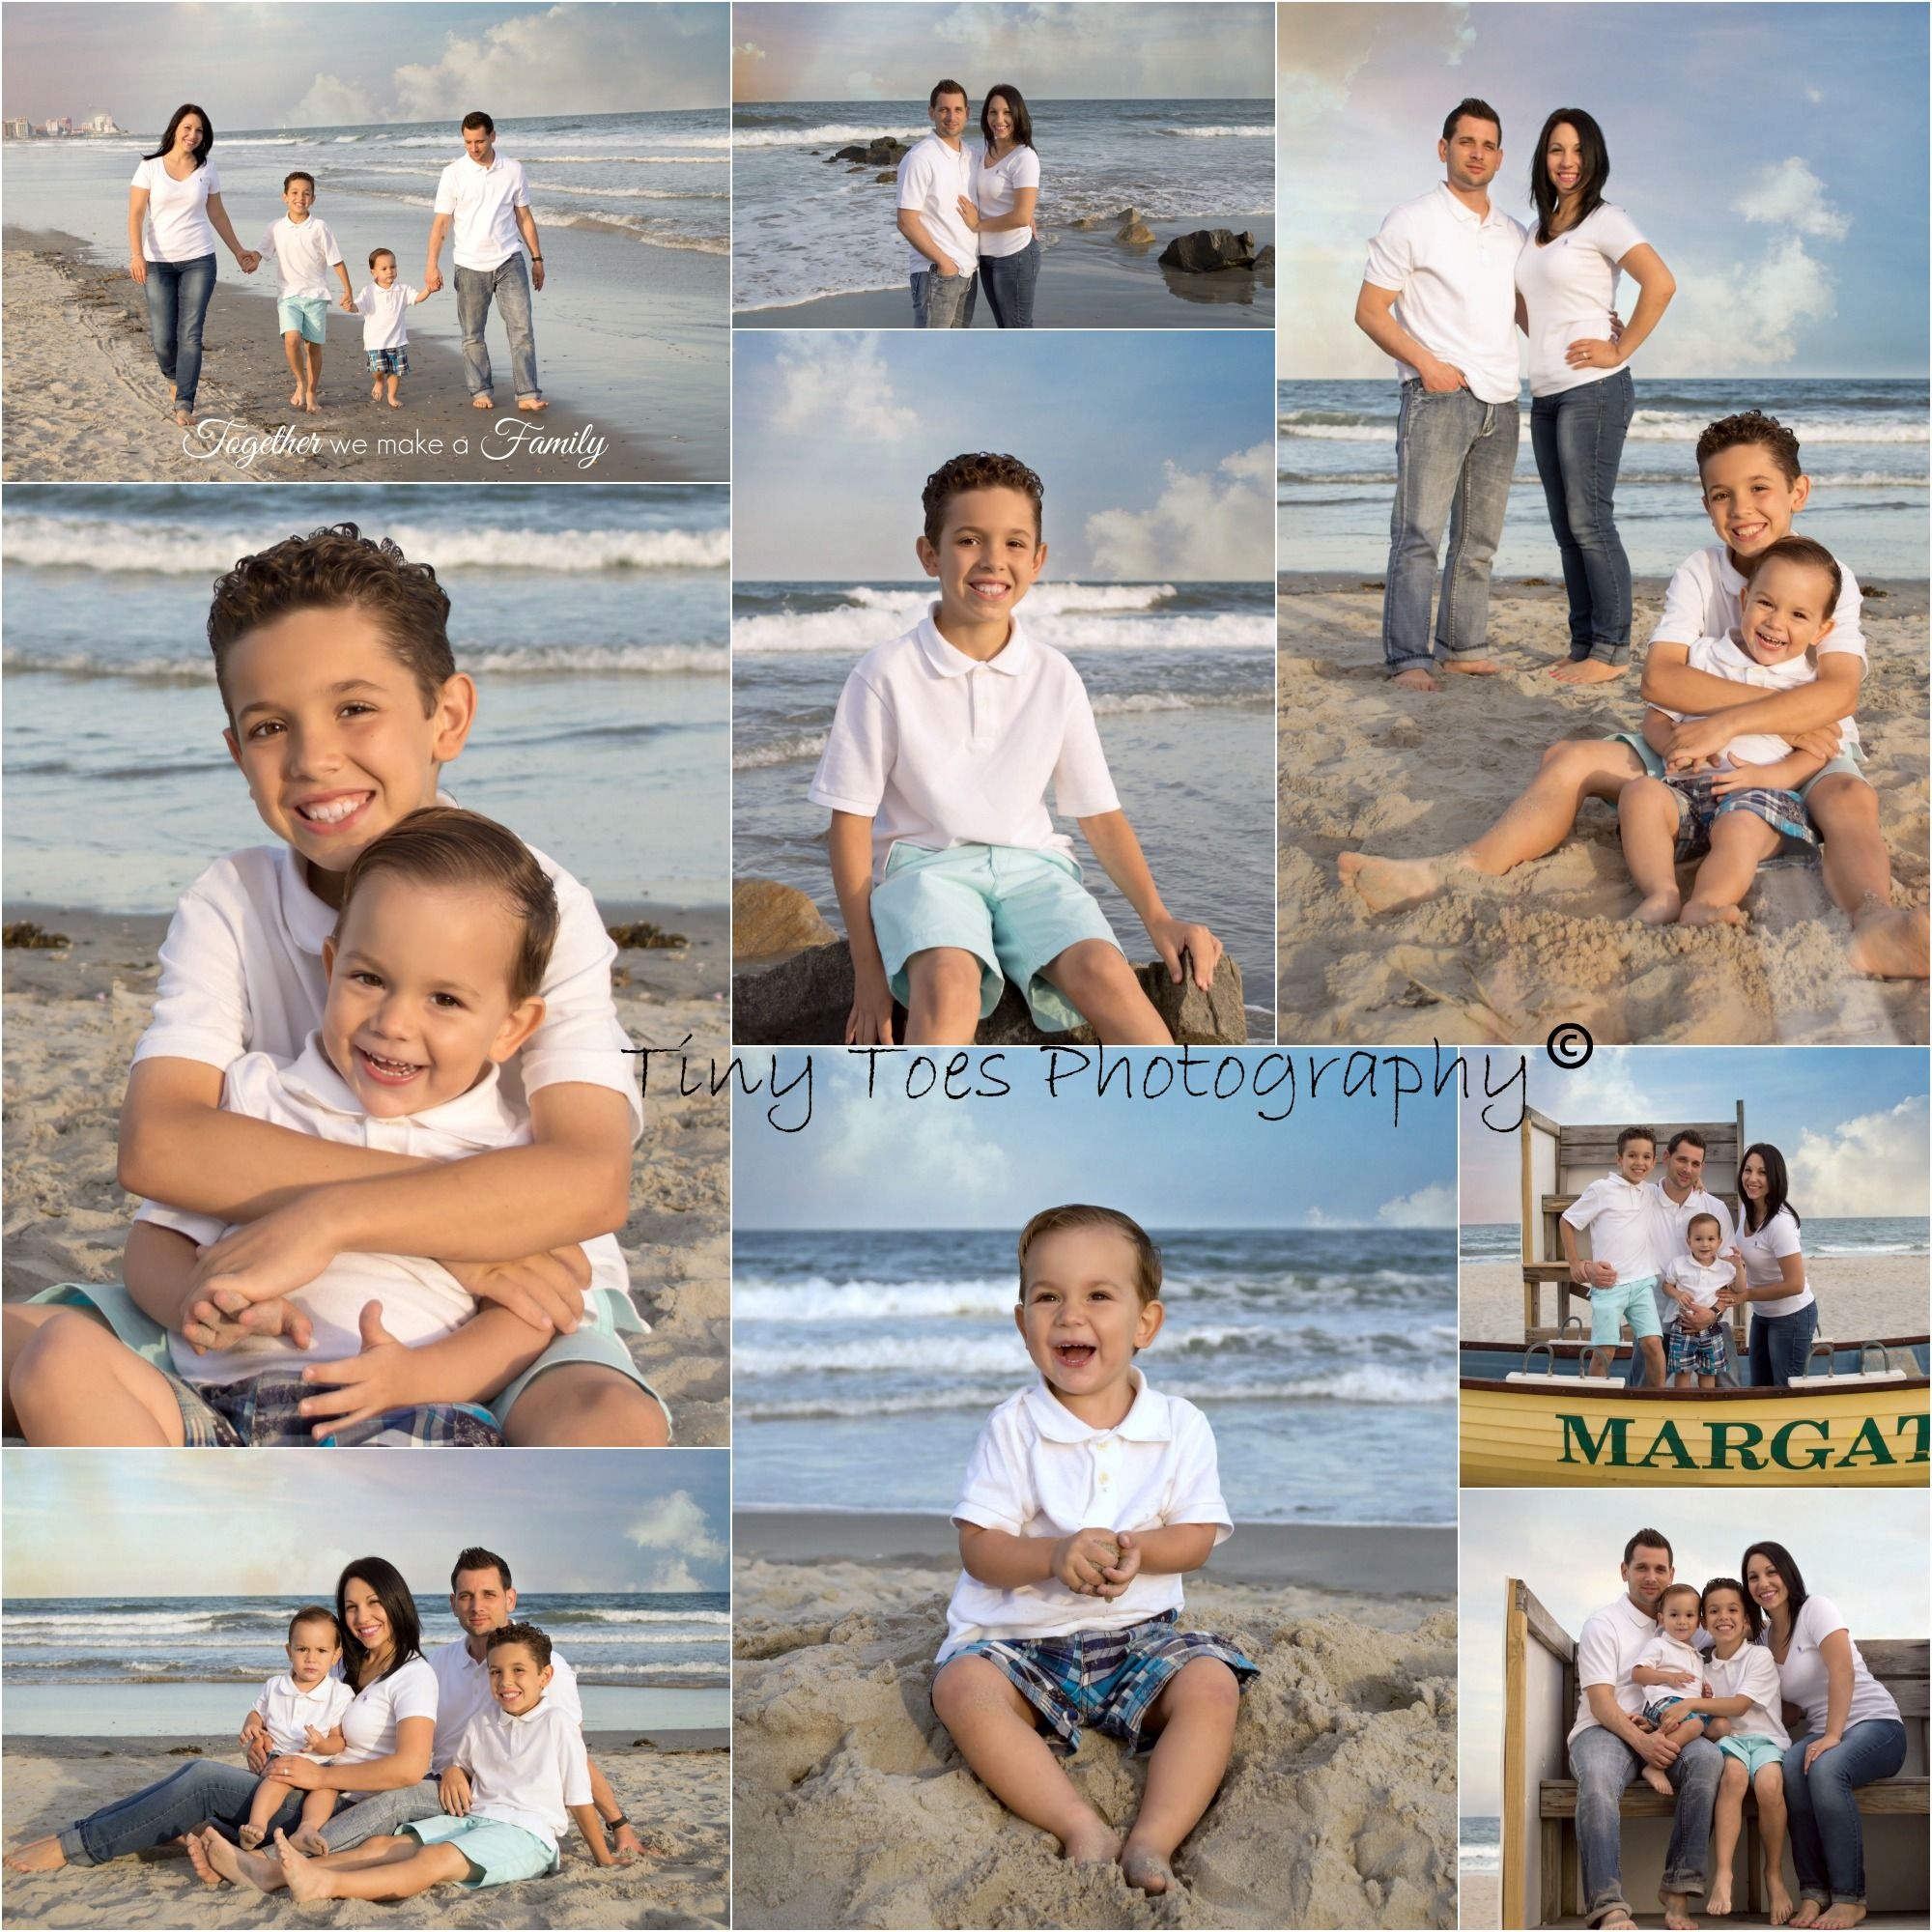 #Tinytoesphotography #familyphotos #southjerseyphotographer #familyphotography #nj #photos #portraits #beachphotos #beachphotography